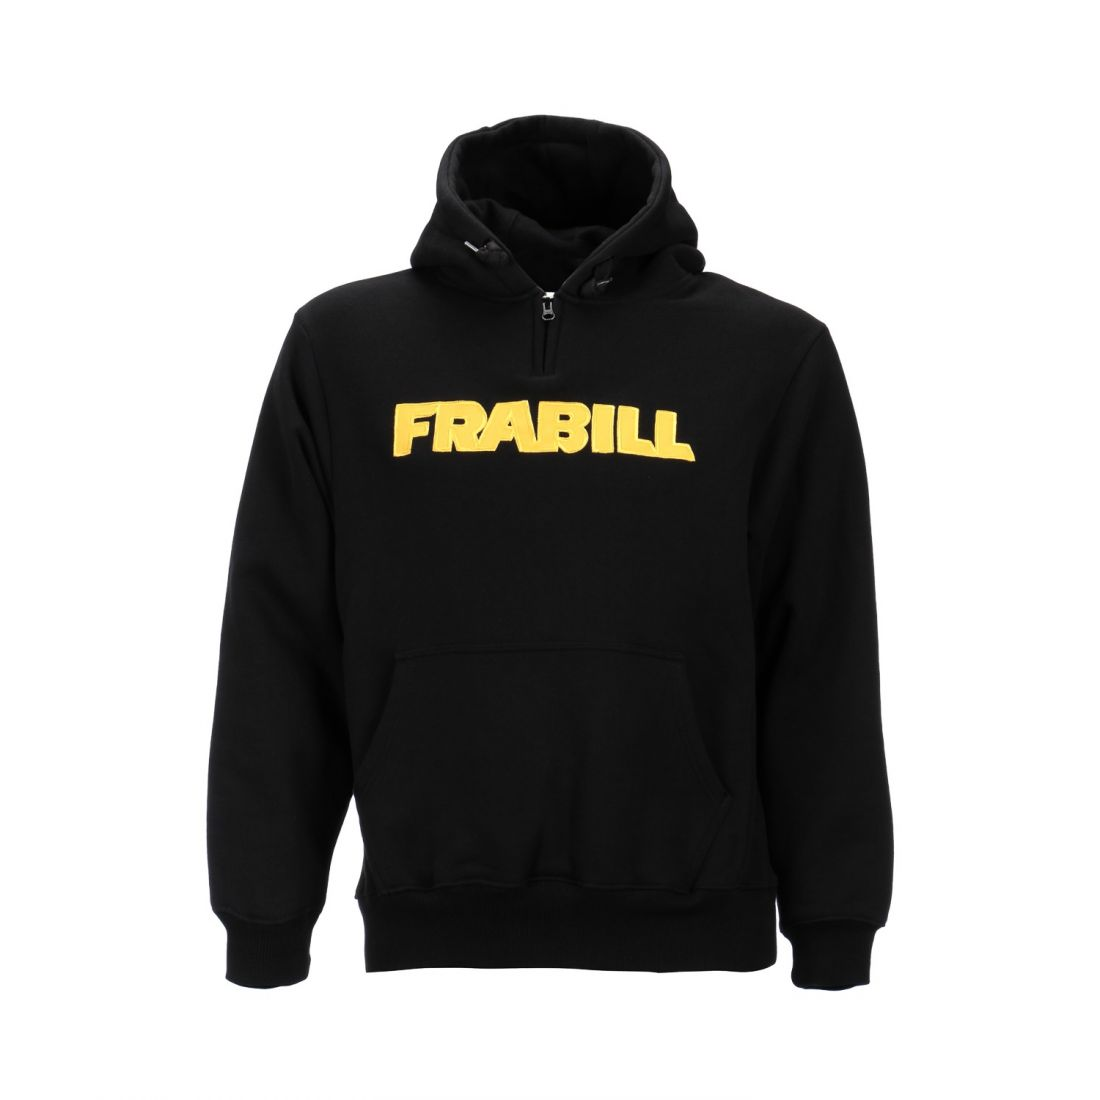 Кенгурушка Frabill Heavyweight Cotton Hooded Sweatshirt черная размер L